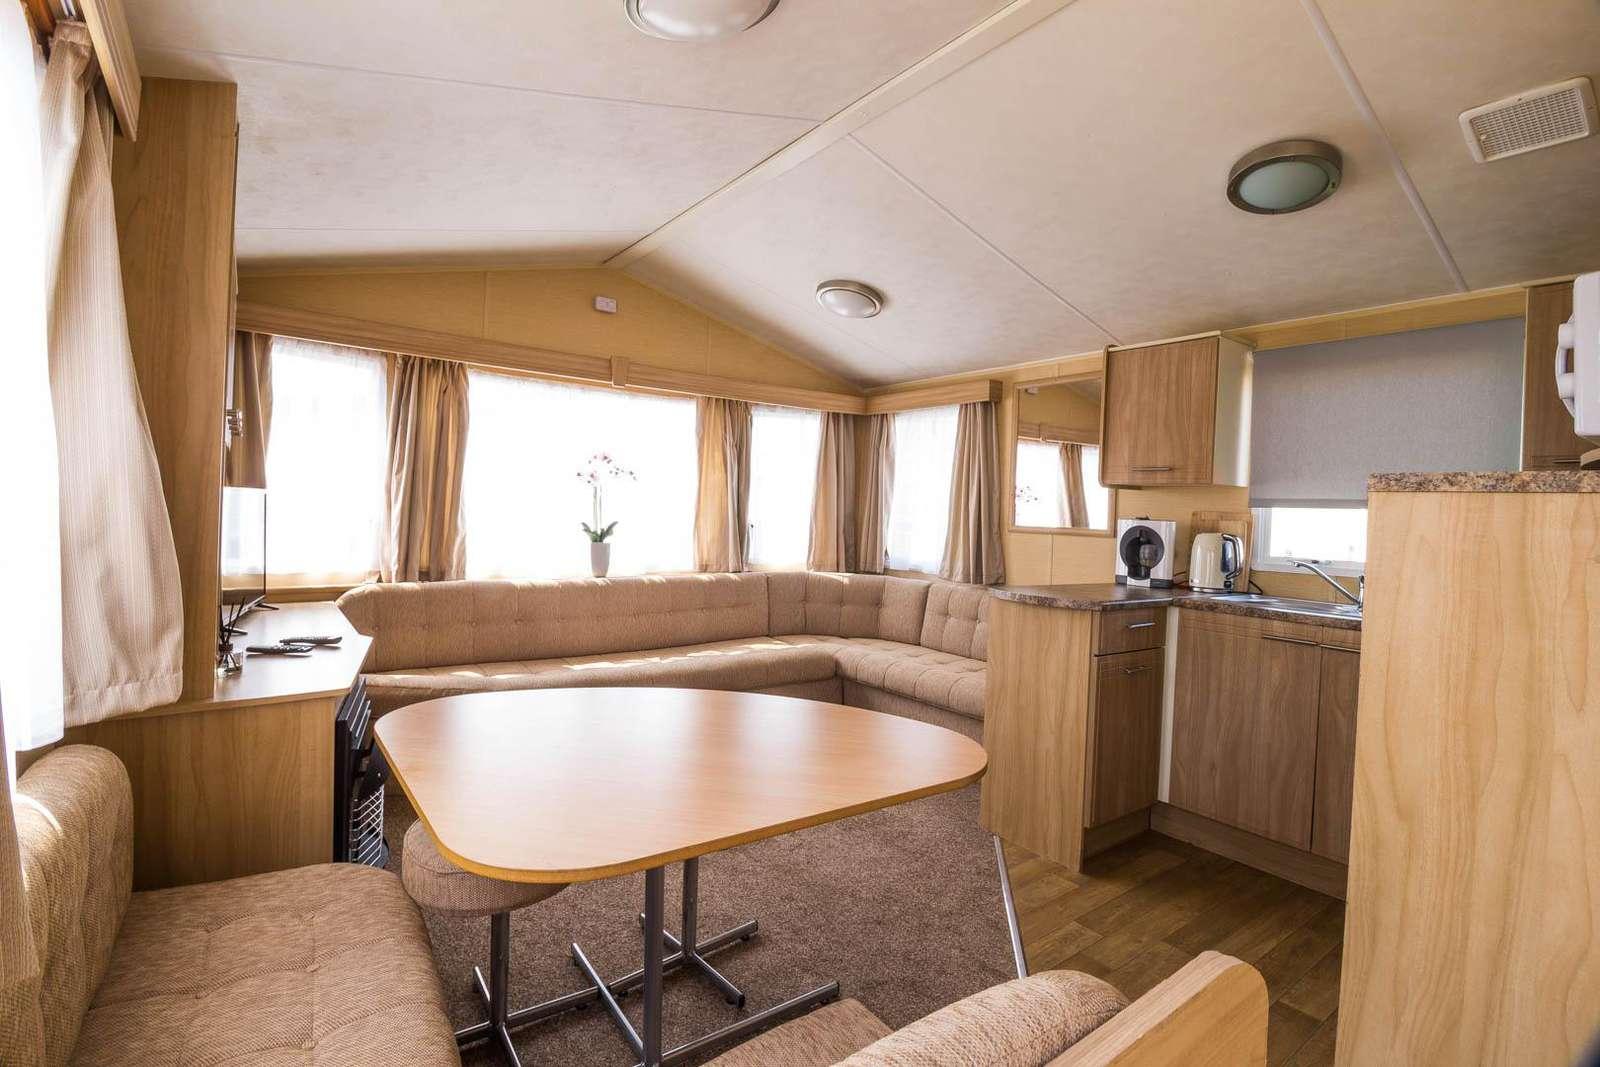 50005D – Dunlin area, 2 bed, 6 berth caravan near park amenities. Ruby Rated. - property